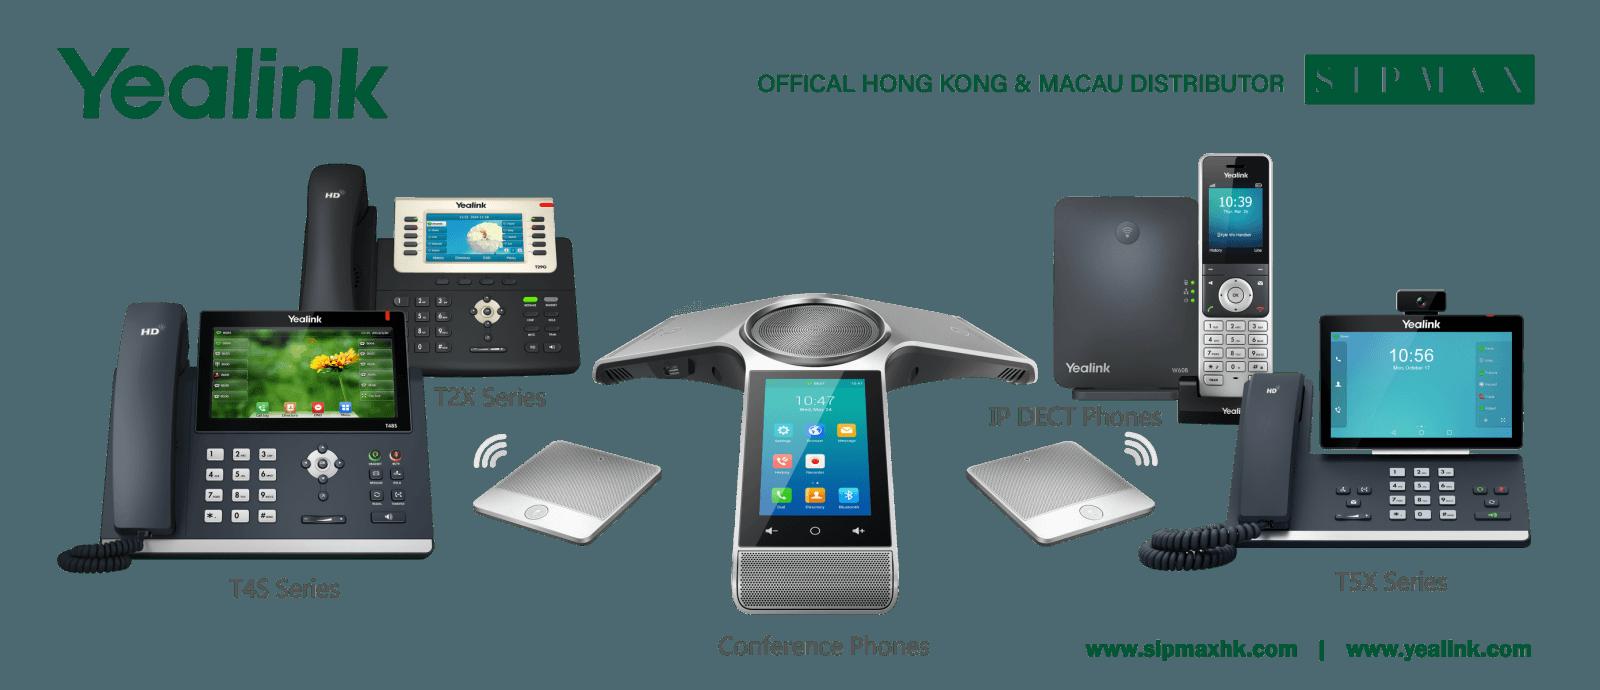 YEALINK 香港代理 - SIPMAX Hong Kong - VOIP 設備供應商